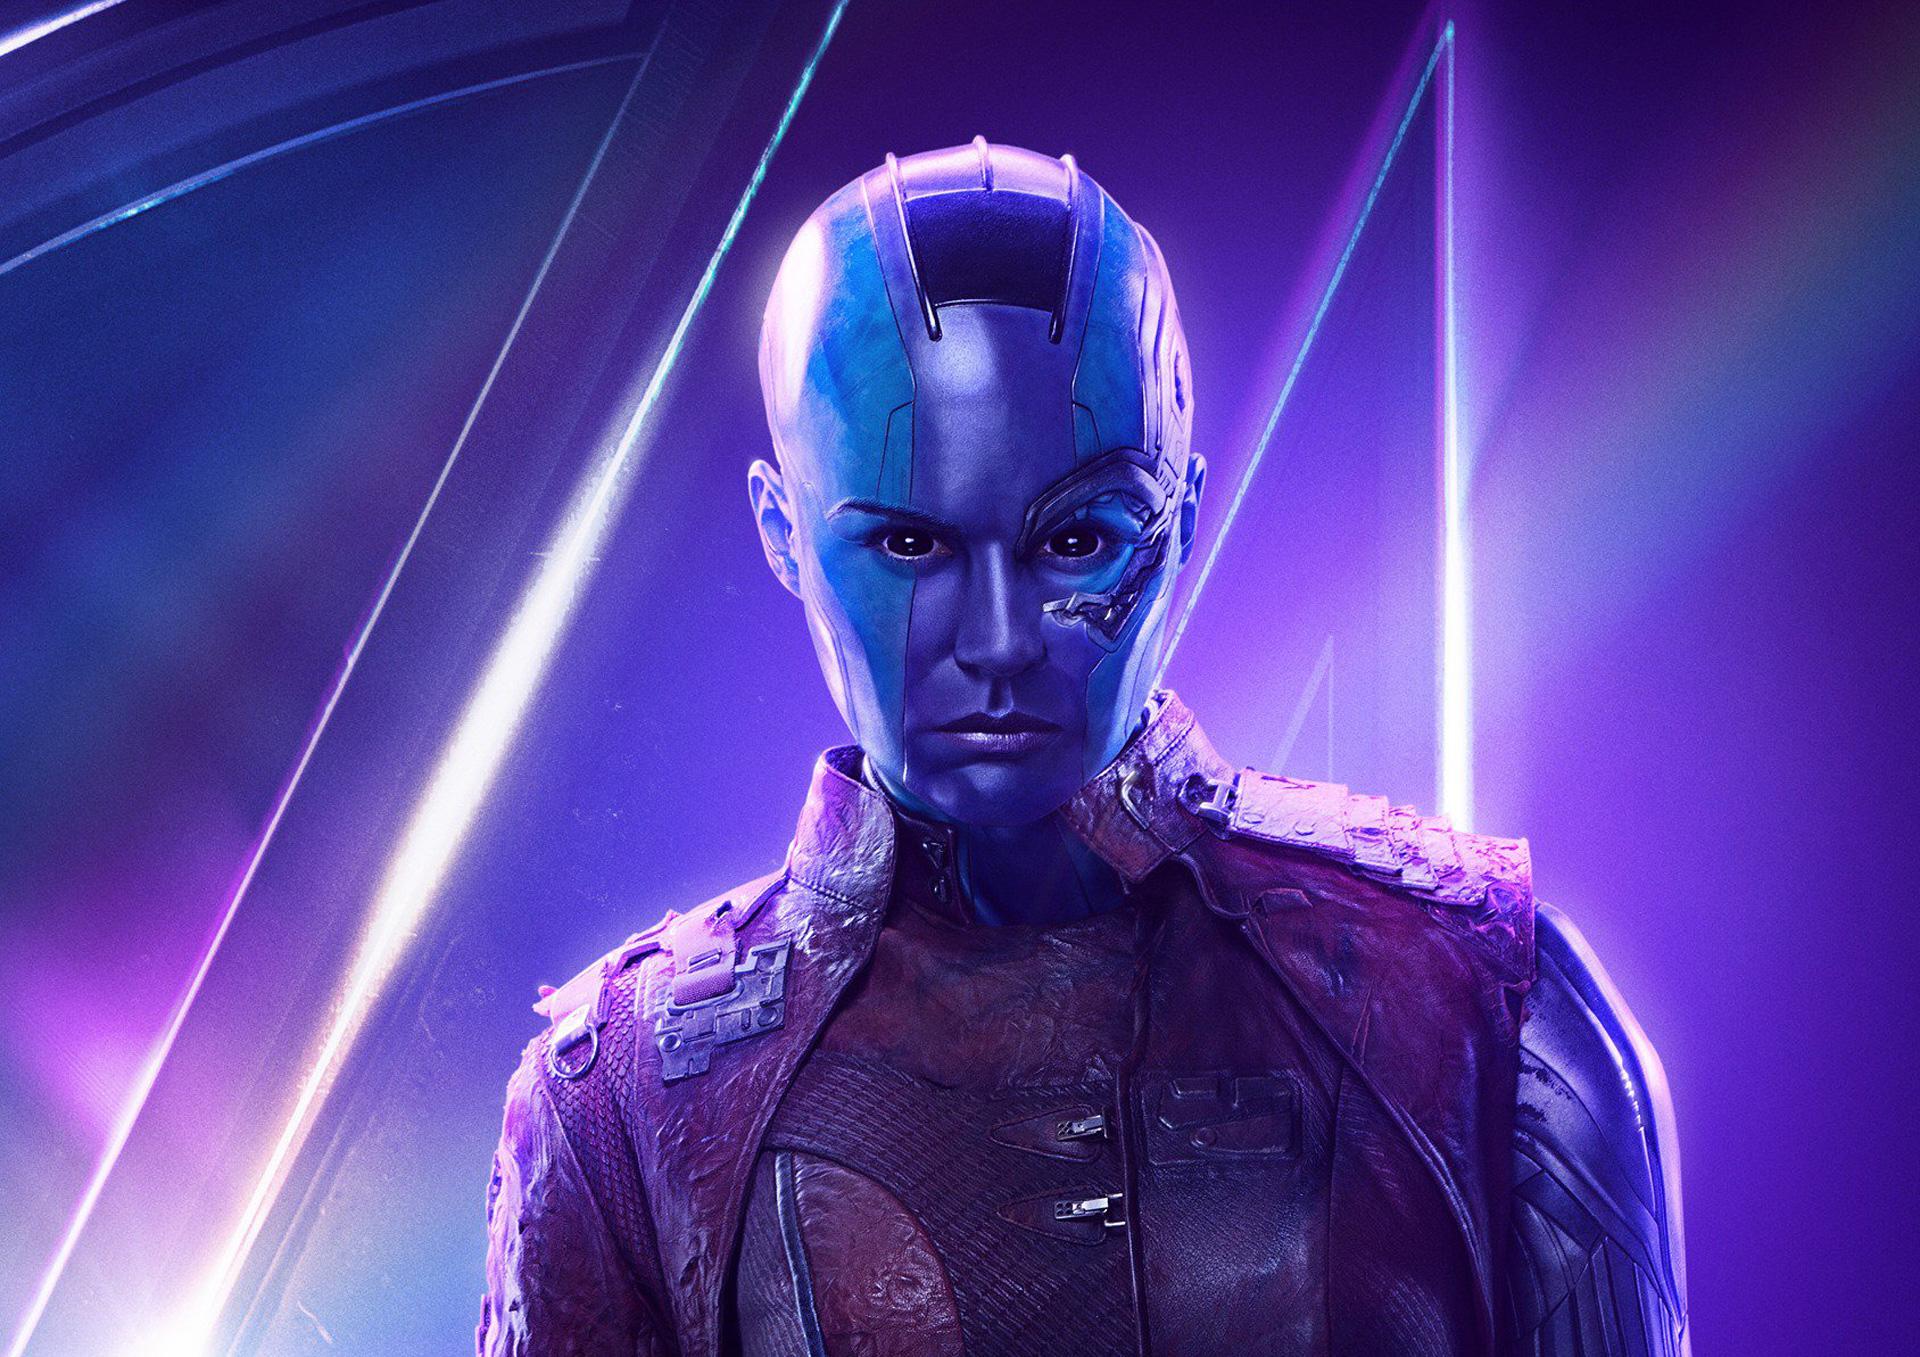 Shuri In Avengers Infinity War New Poster Hd Movies 4k: Nebula In Avengers Infinity War New Poster, HD Movies, 4k